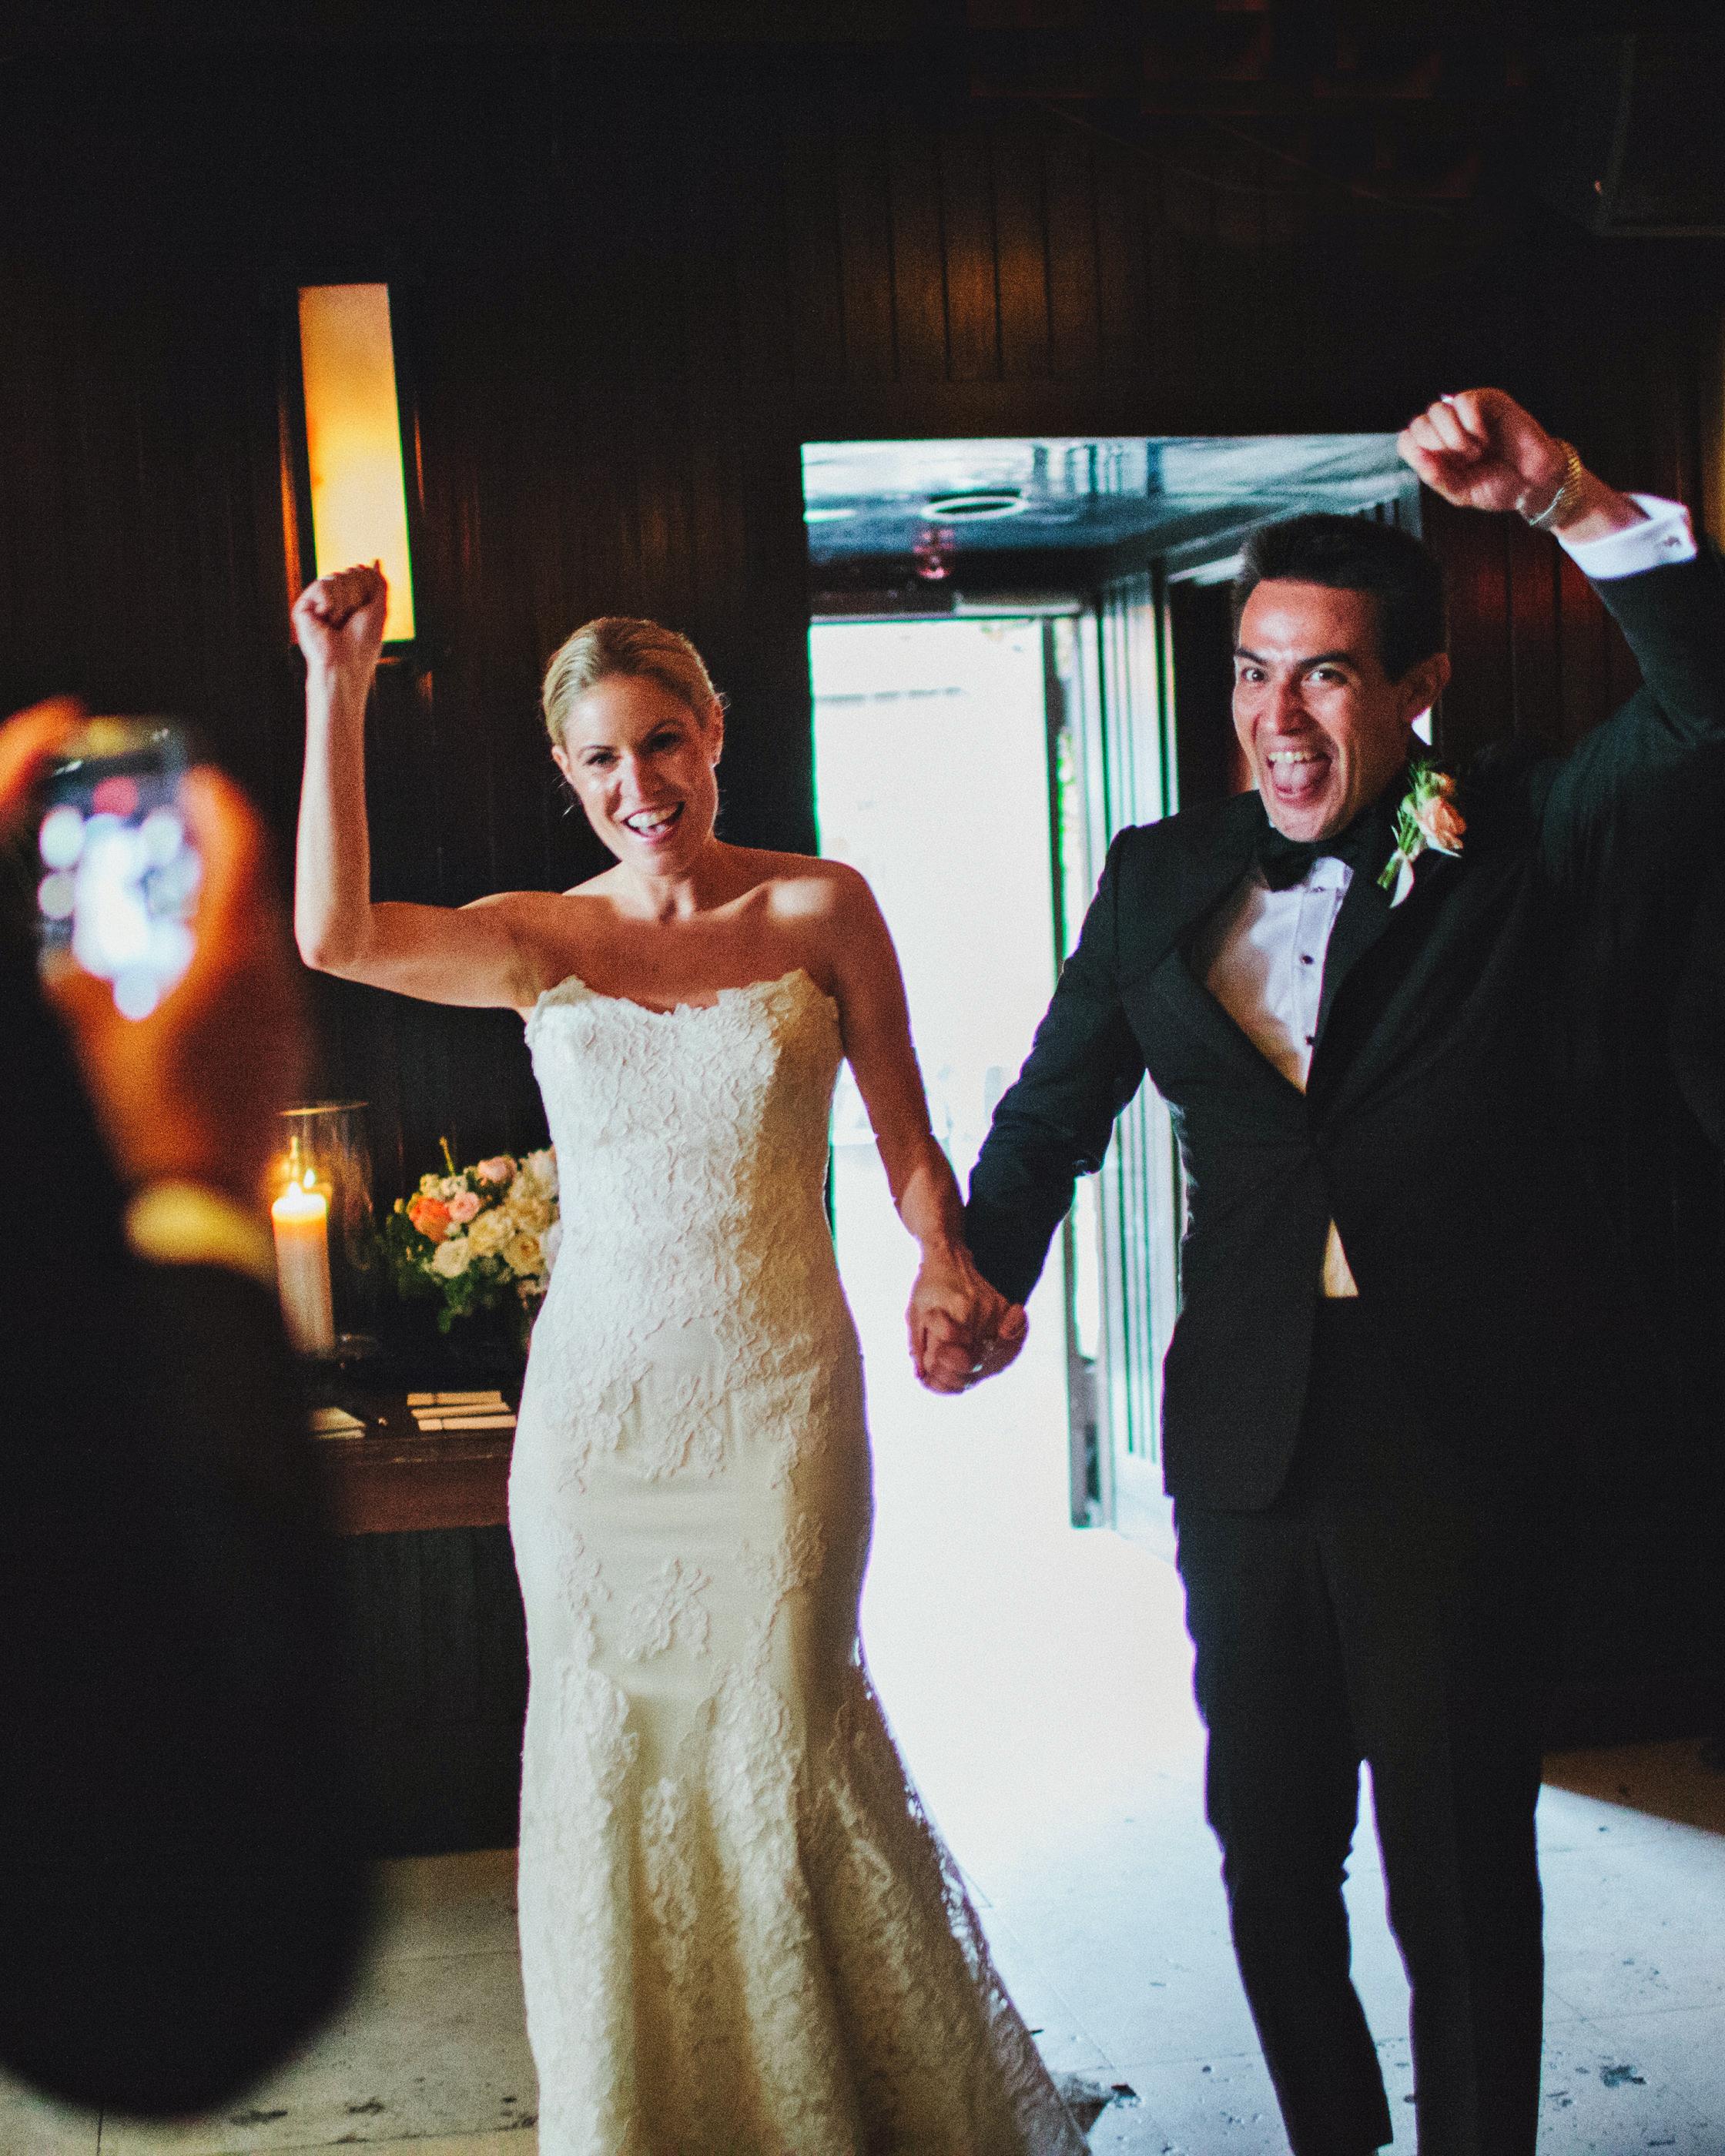 tina-raul-wedding-entrance3-0314.jpg